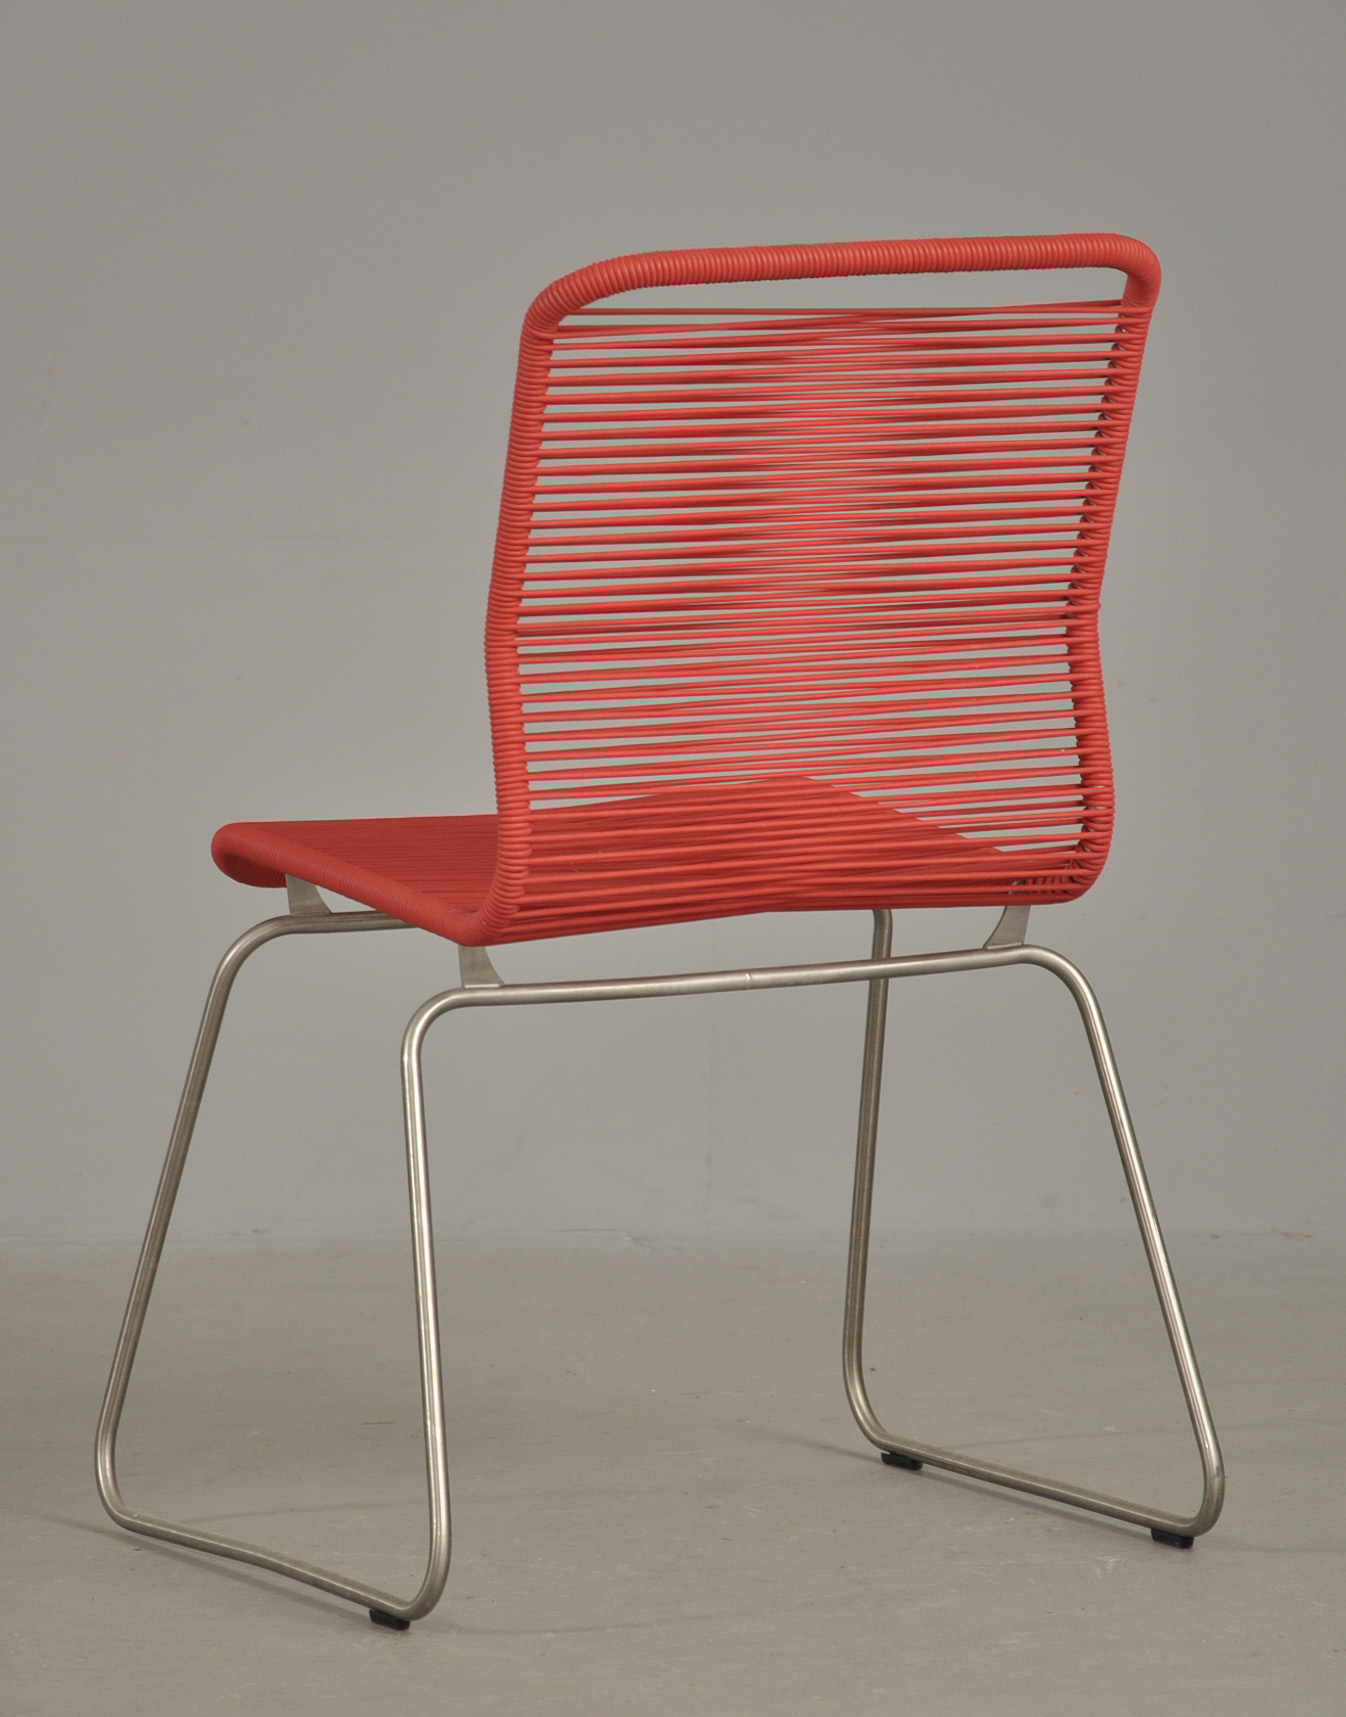 Verner Panton 1926 1990: 'Tivoli' stol, rød |